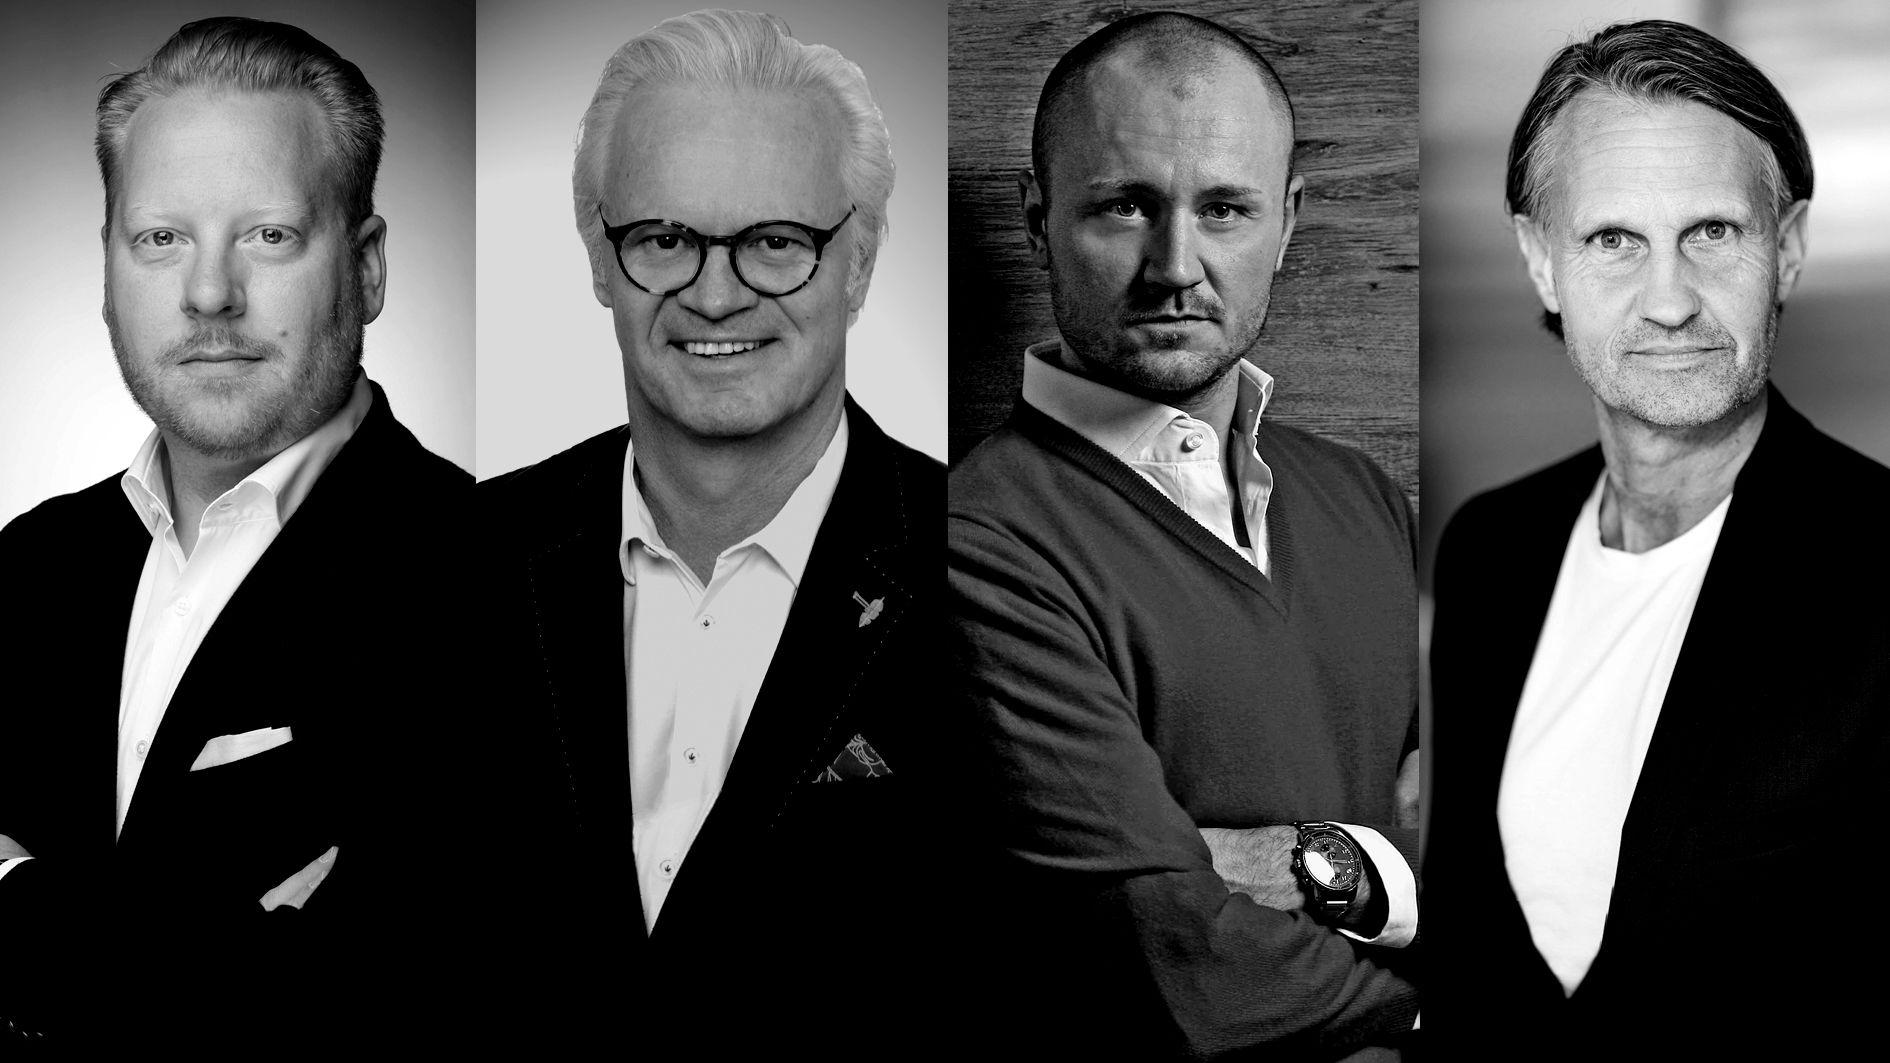 Aulbach Gruppe Erweitert Geschaftsfuhrung Neue Top Manager Fur Daniel Hechter Und Karl Lagerfeld